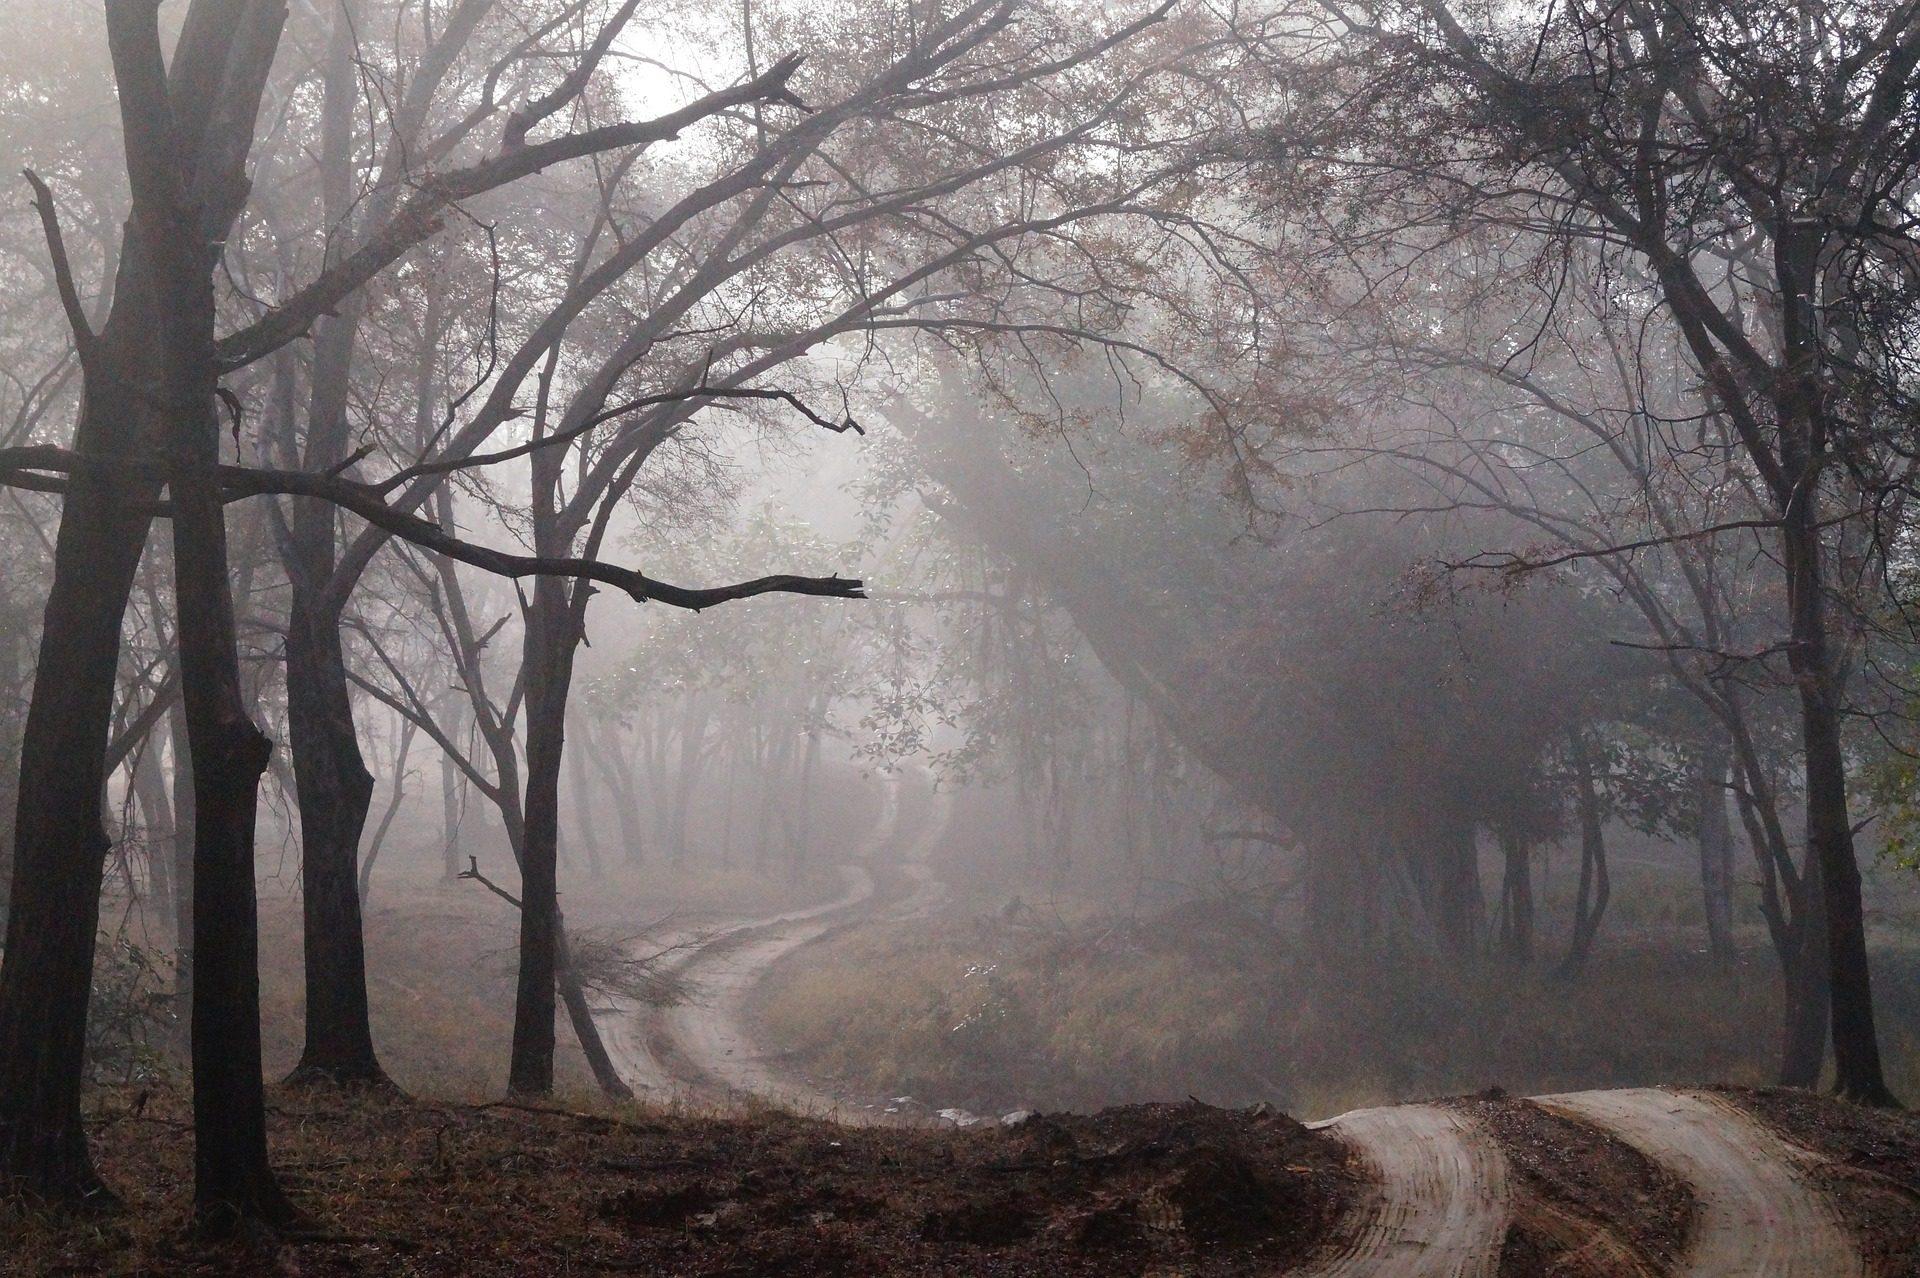 Route, Forest, sombrío, brouillard, arbres, Sombre - Fonds d'écran HD - Professor-falken.com